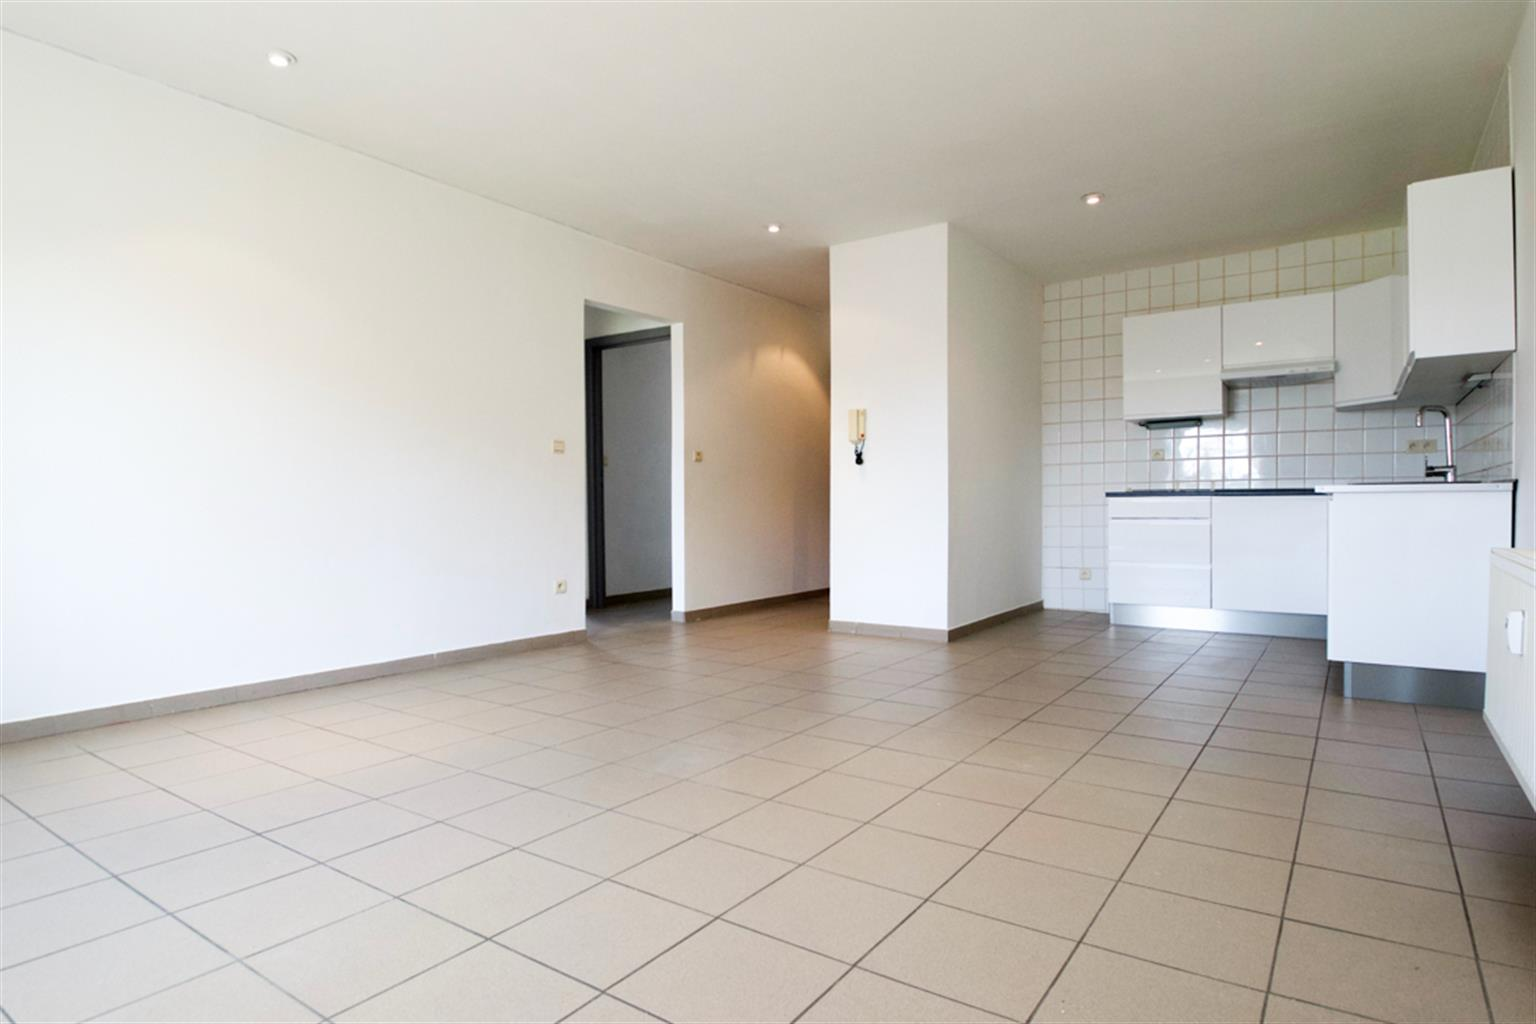 Appartement - Leval-Trahegnies - #3779559-1